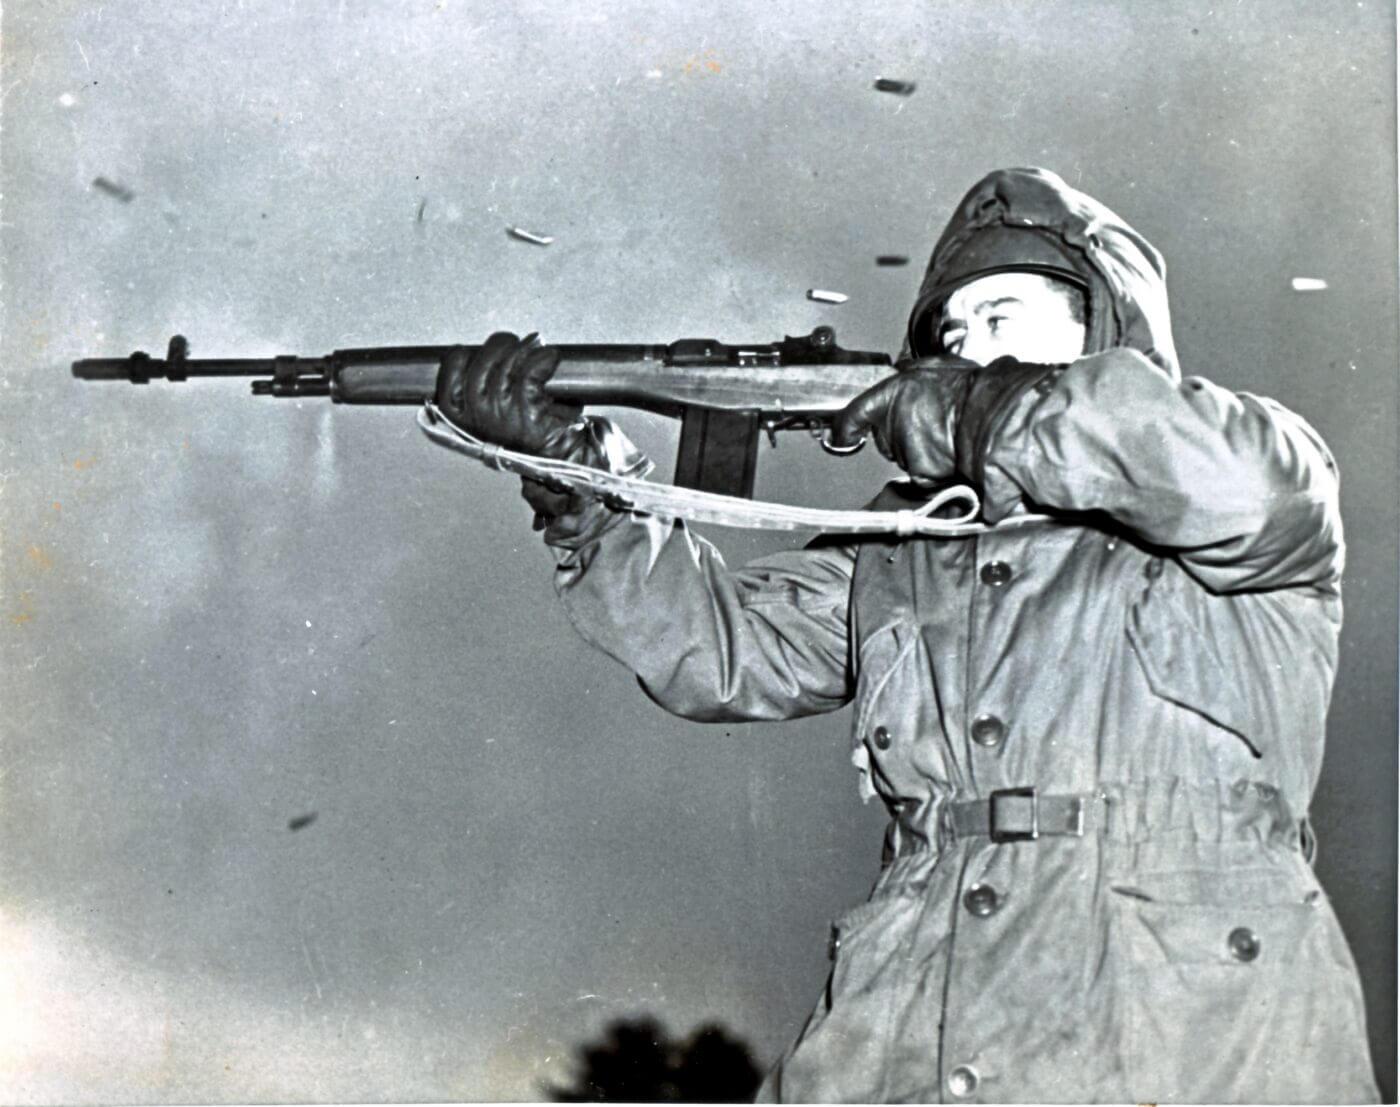 U.S. soldier firing an M14 in January 1952